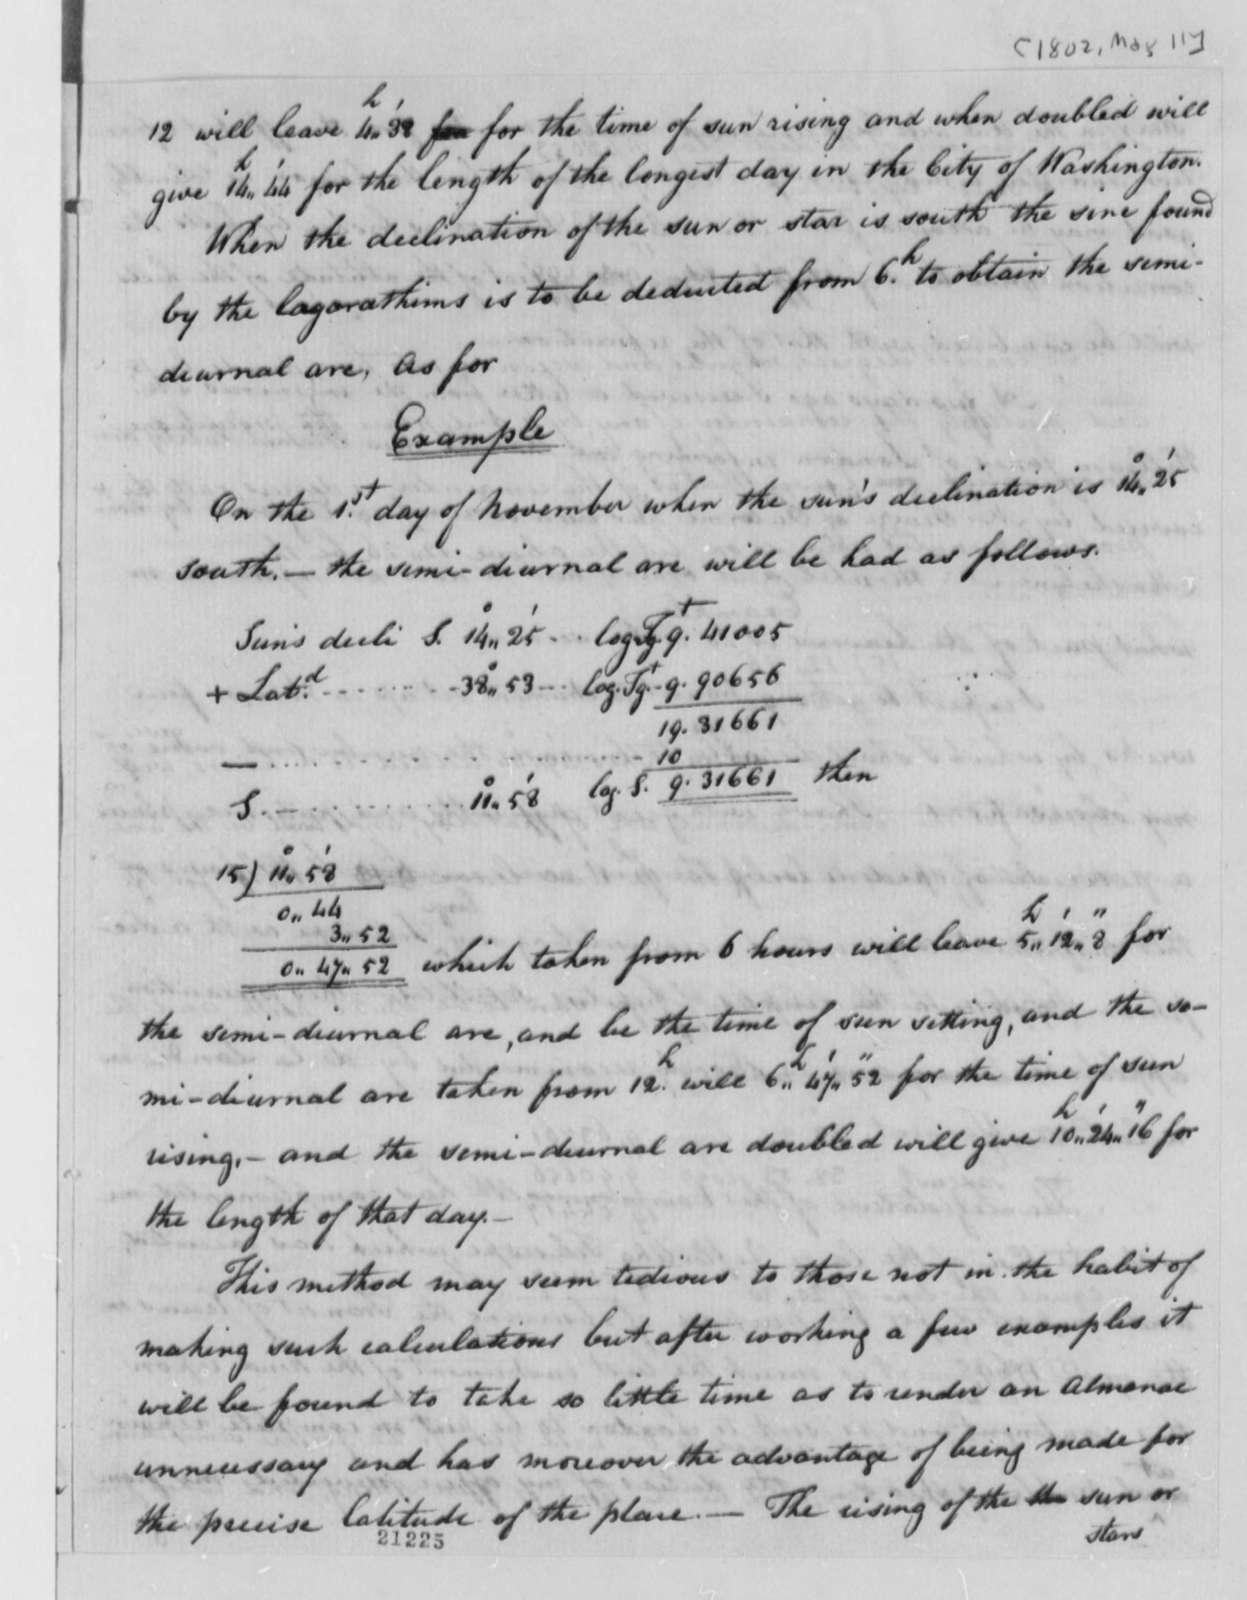 Andrew Ellicott to Thomas Jefferson, May 11, 1802